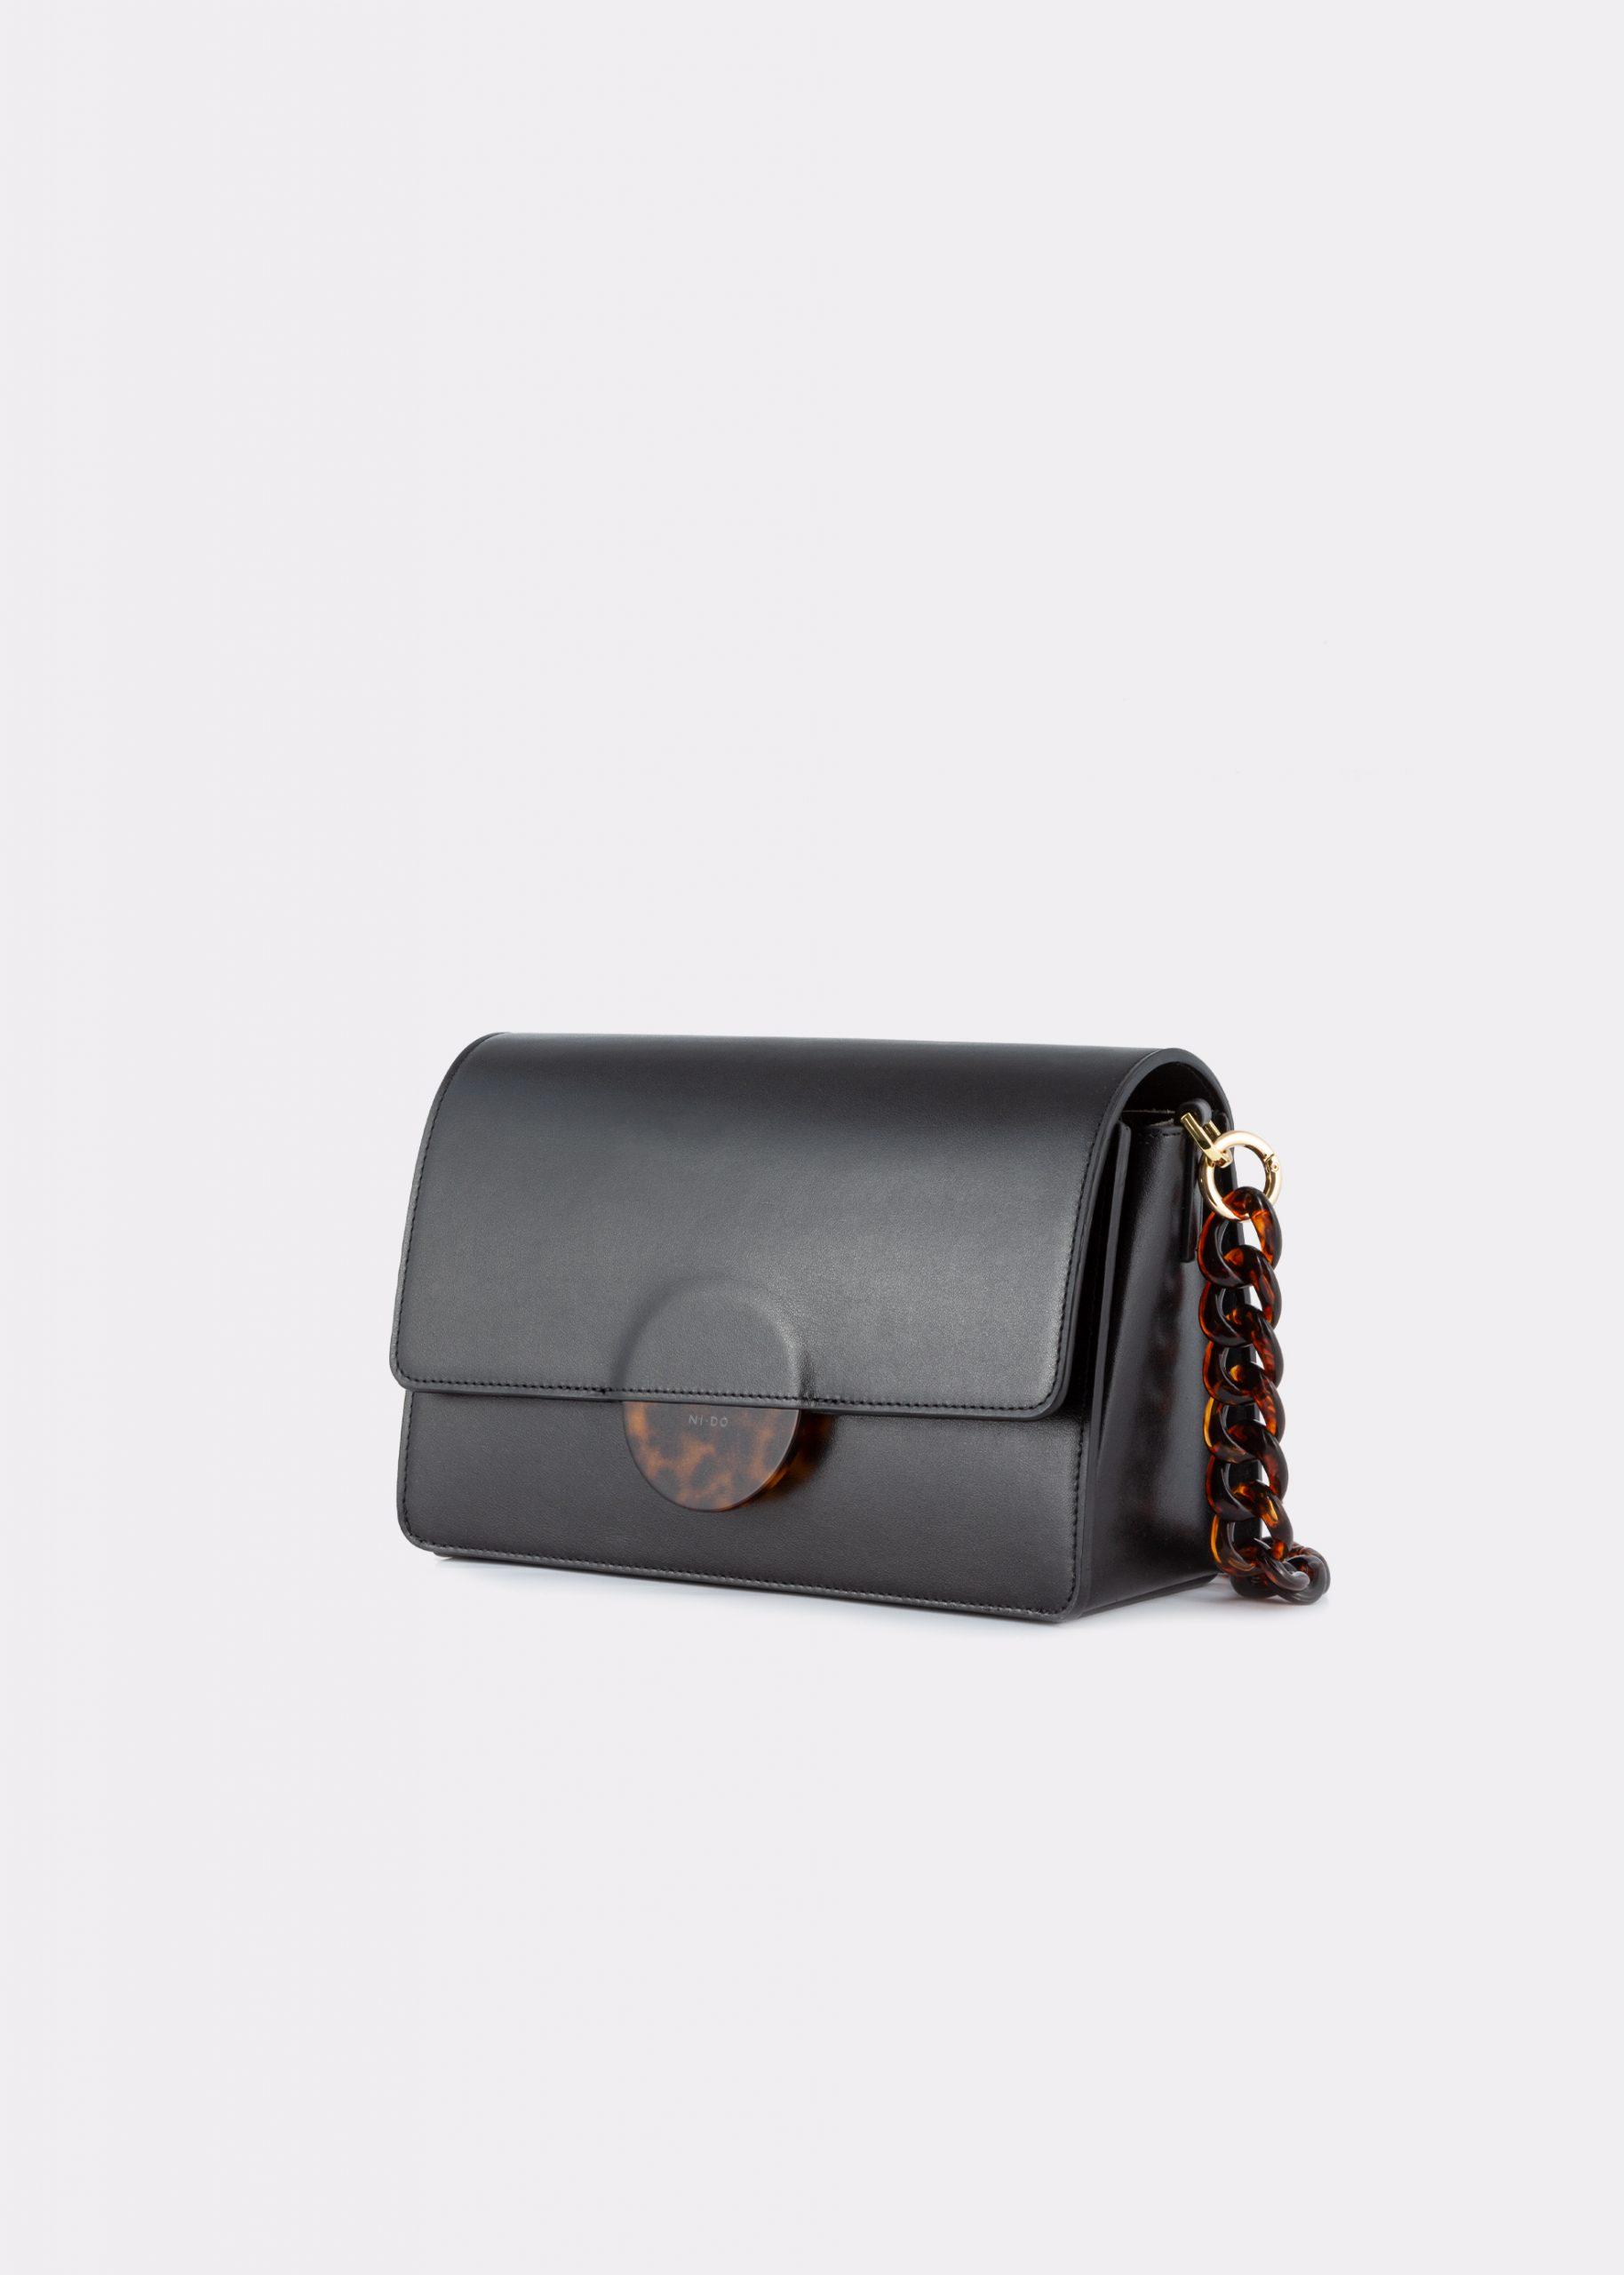 NIDO Cuore_Maxi bag black side view